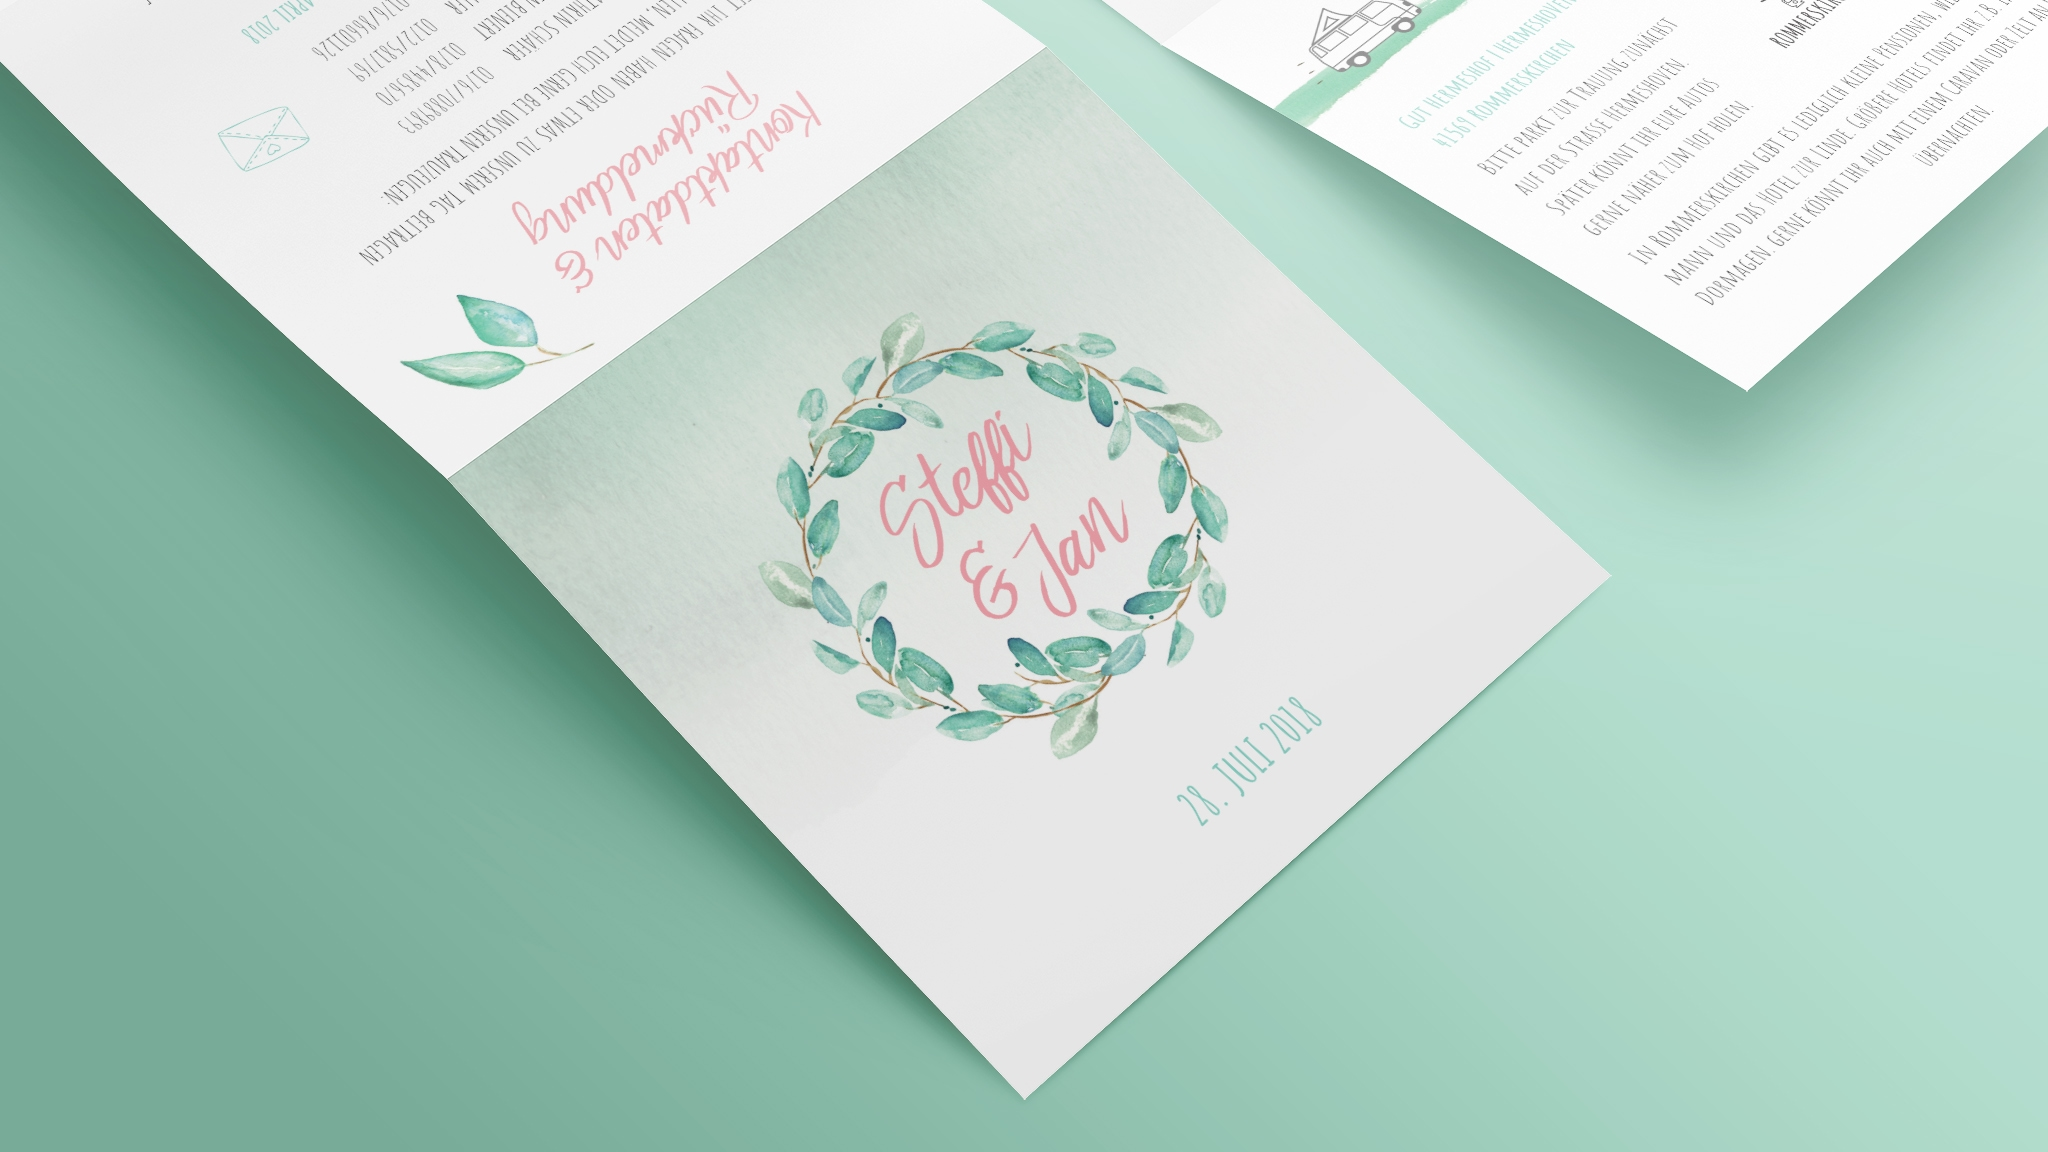 Hochzeitskarten Steffi Jan Maik Grabosch Creations